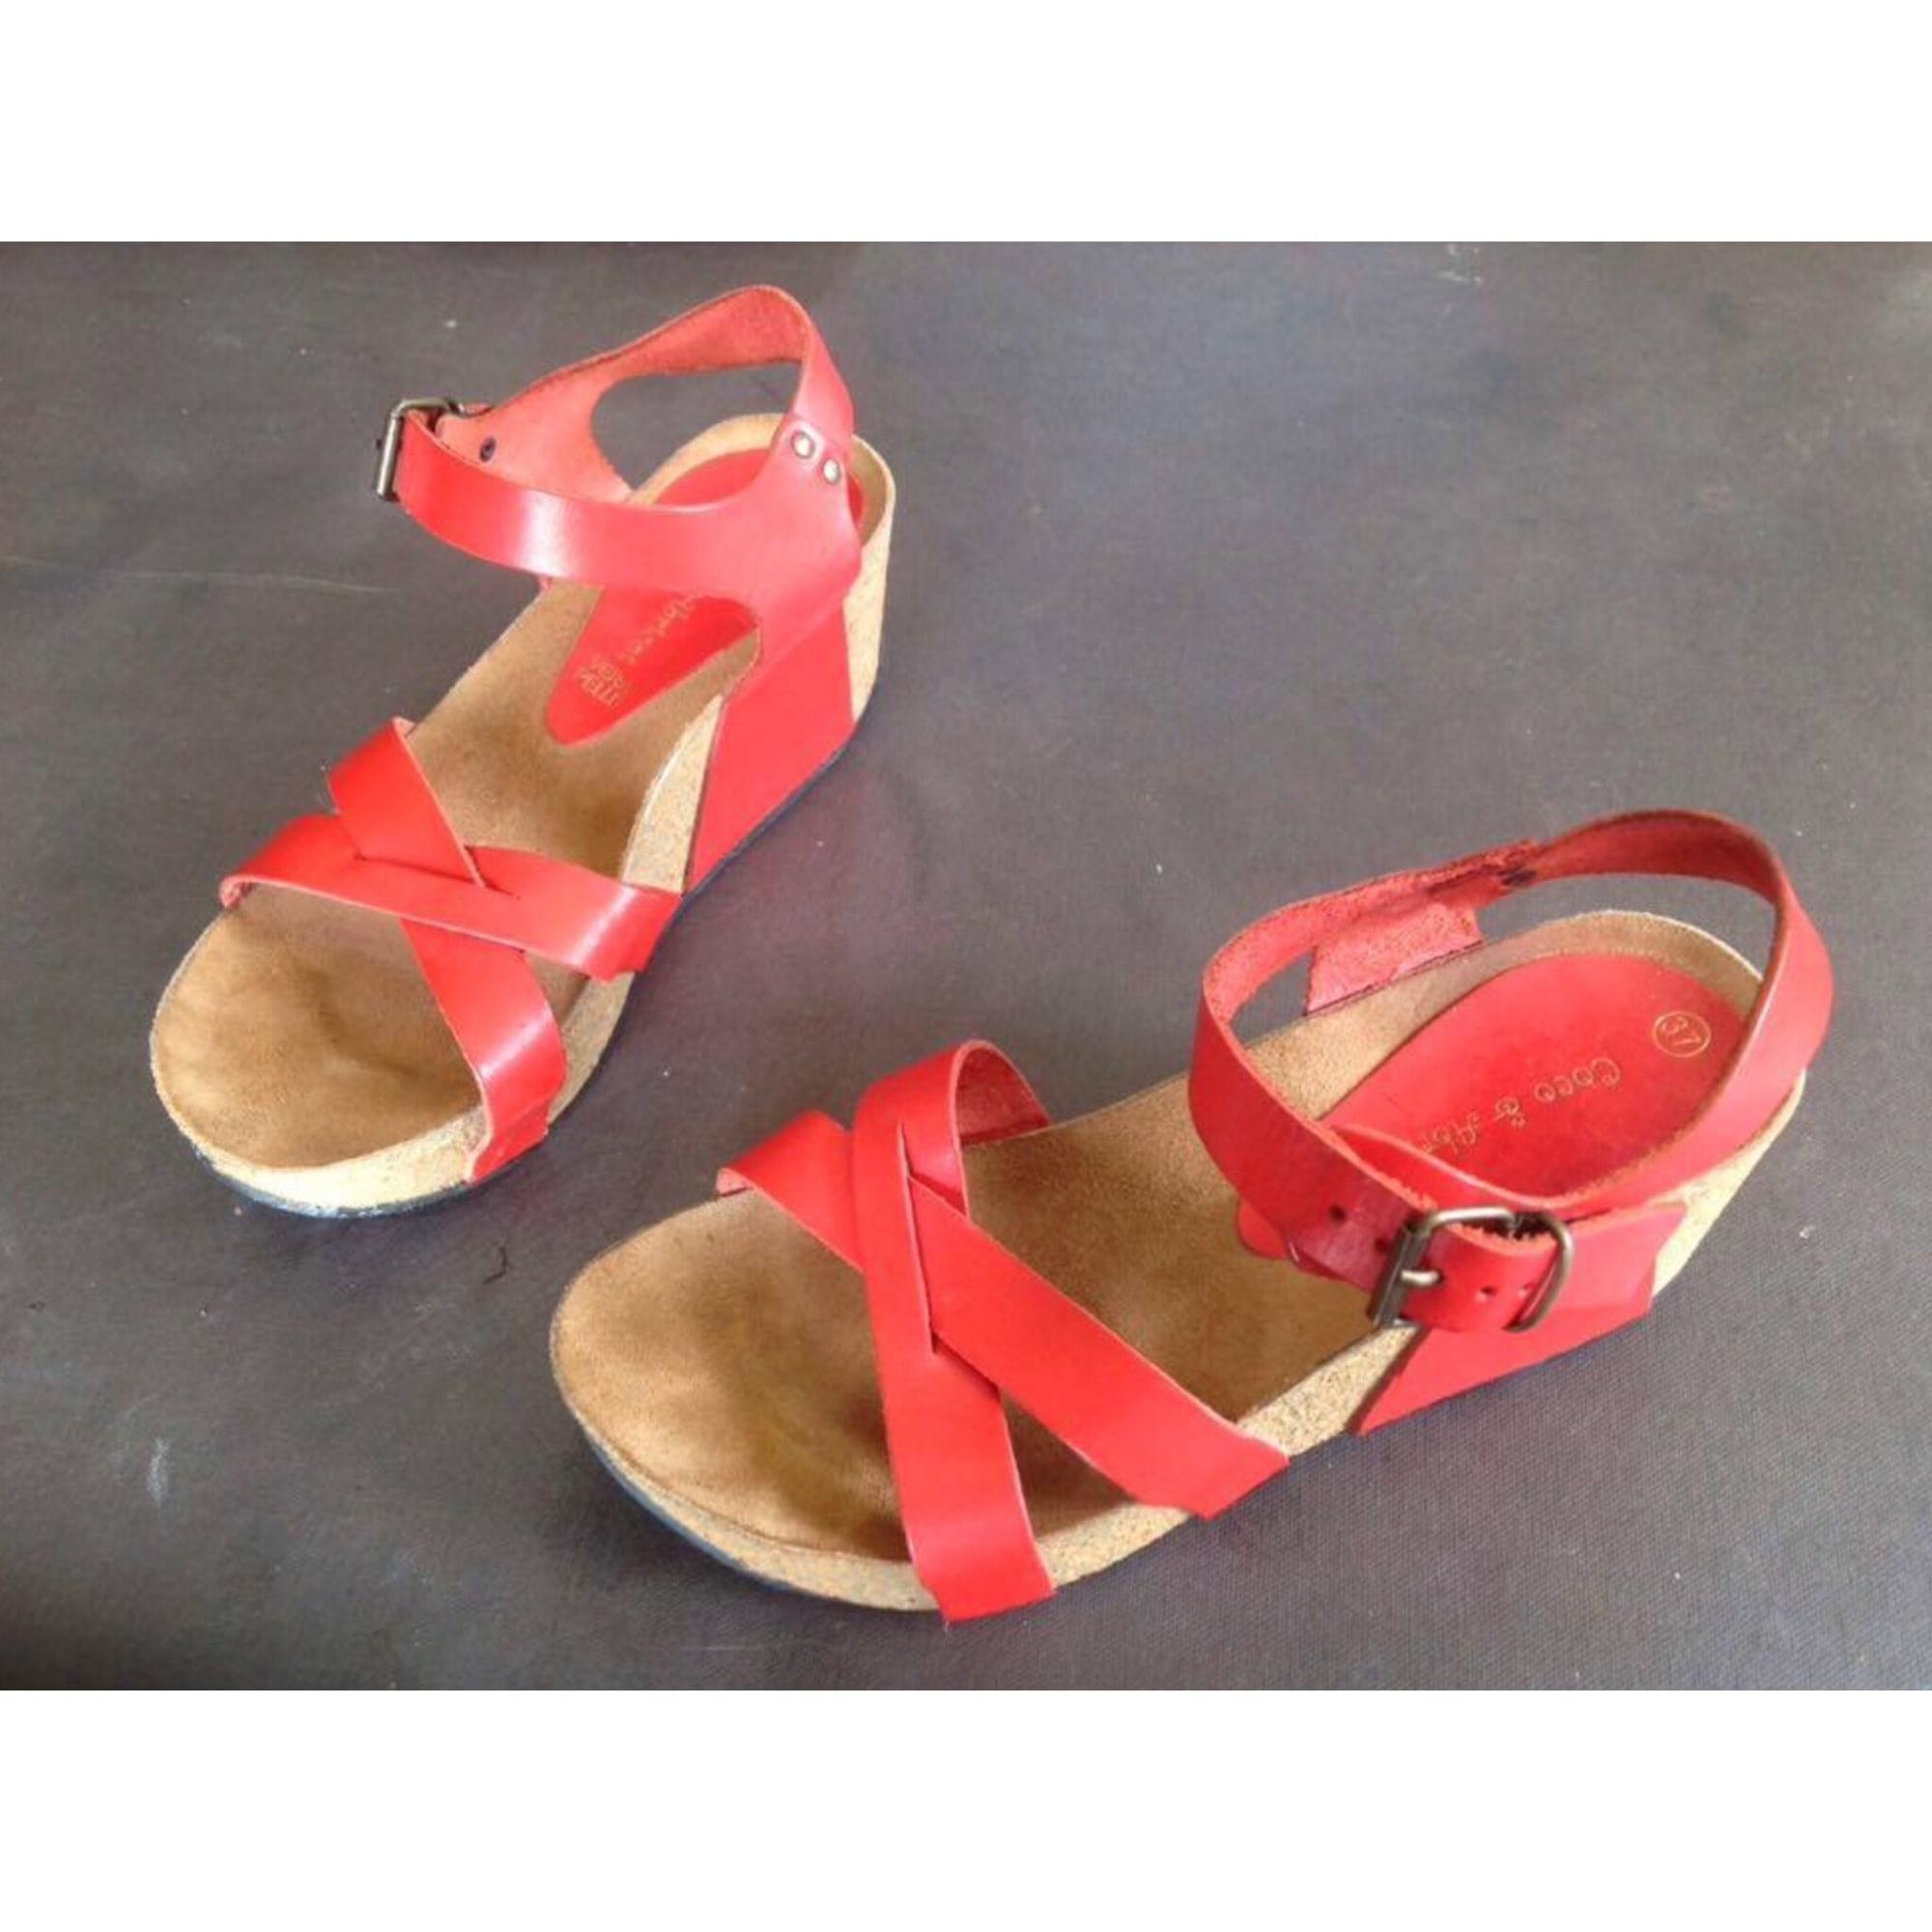 Sandales compensées COCO COCO COCO & ABRICOT 37 rouge 7682237 37f9a0